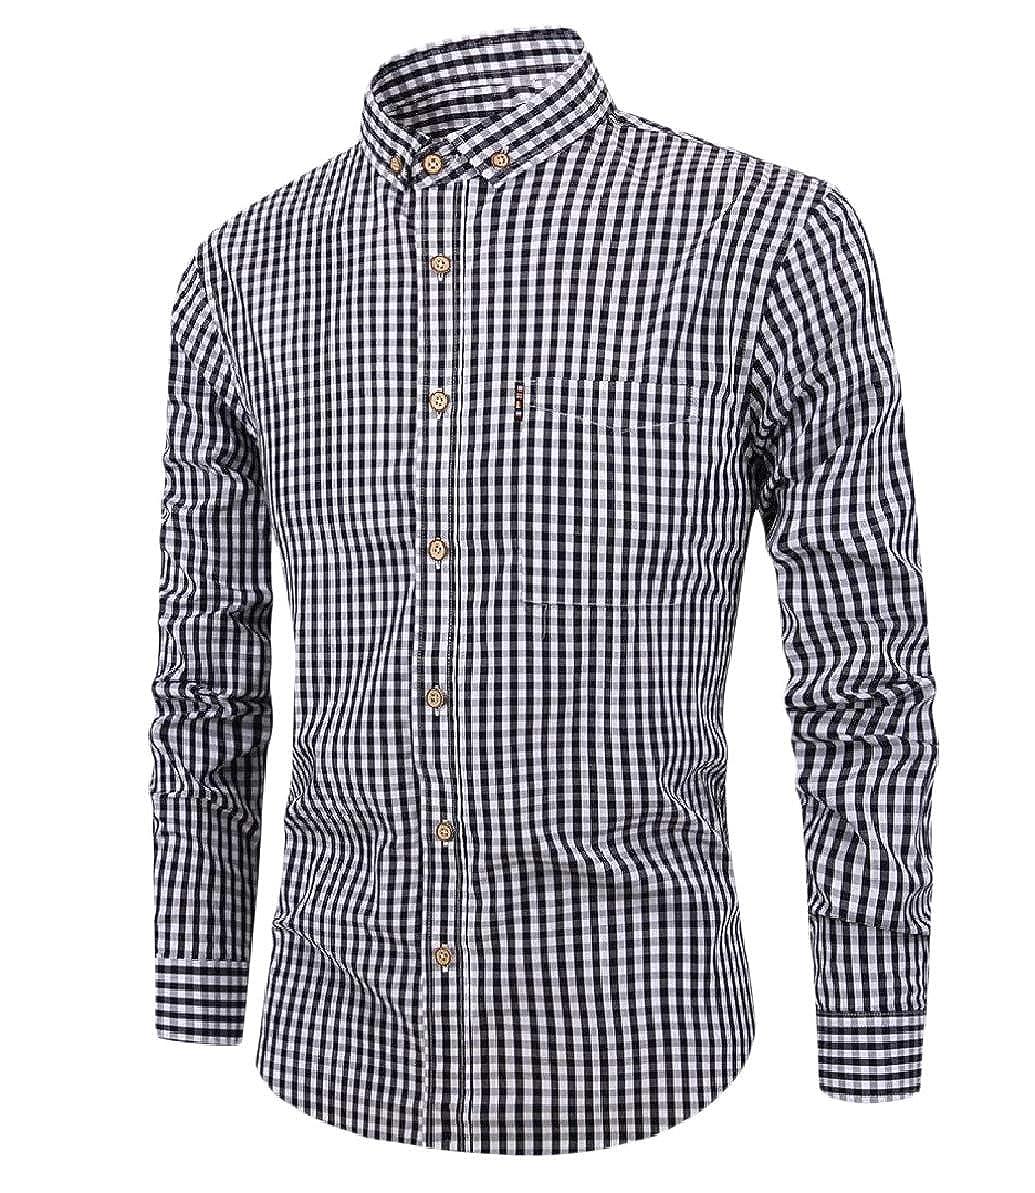 Zimaes-Men Plaid Breathable Business Long Sleeve Blouse Western Shirt